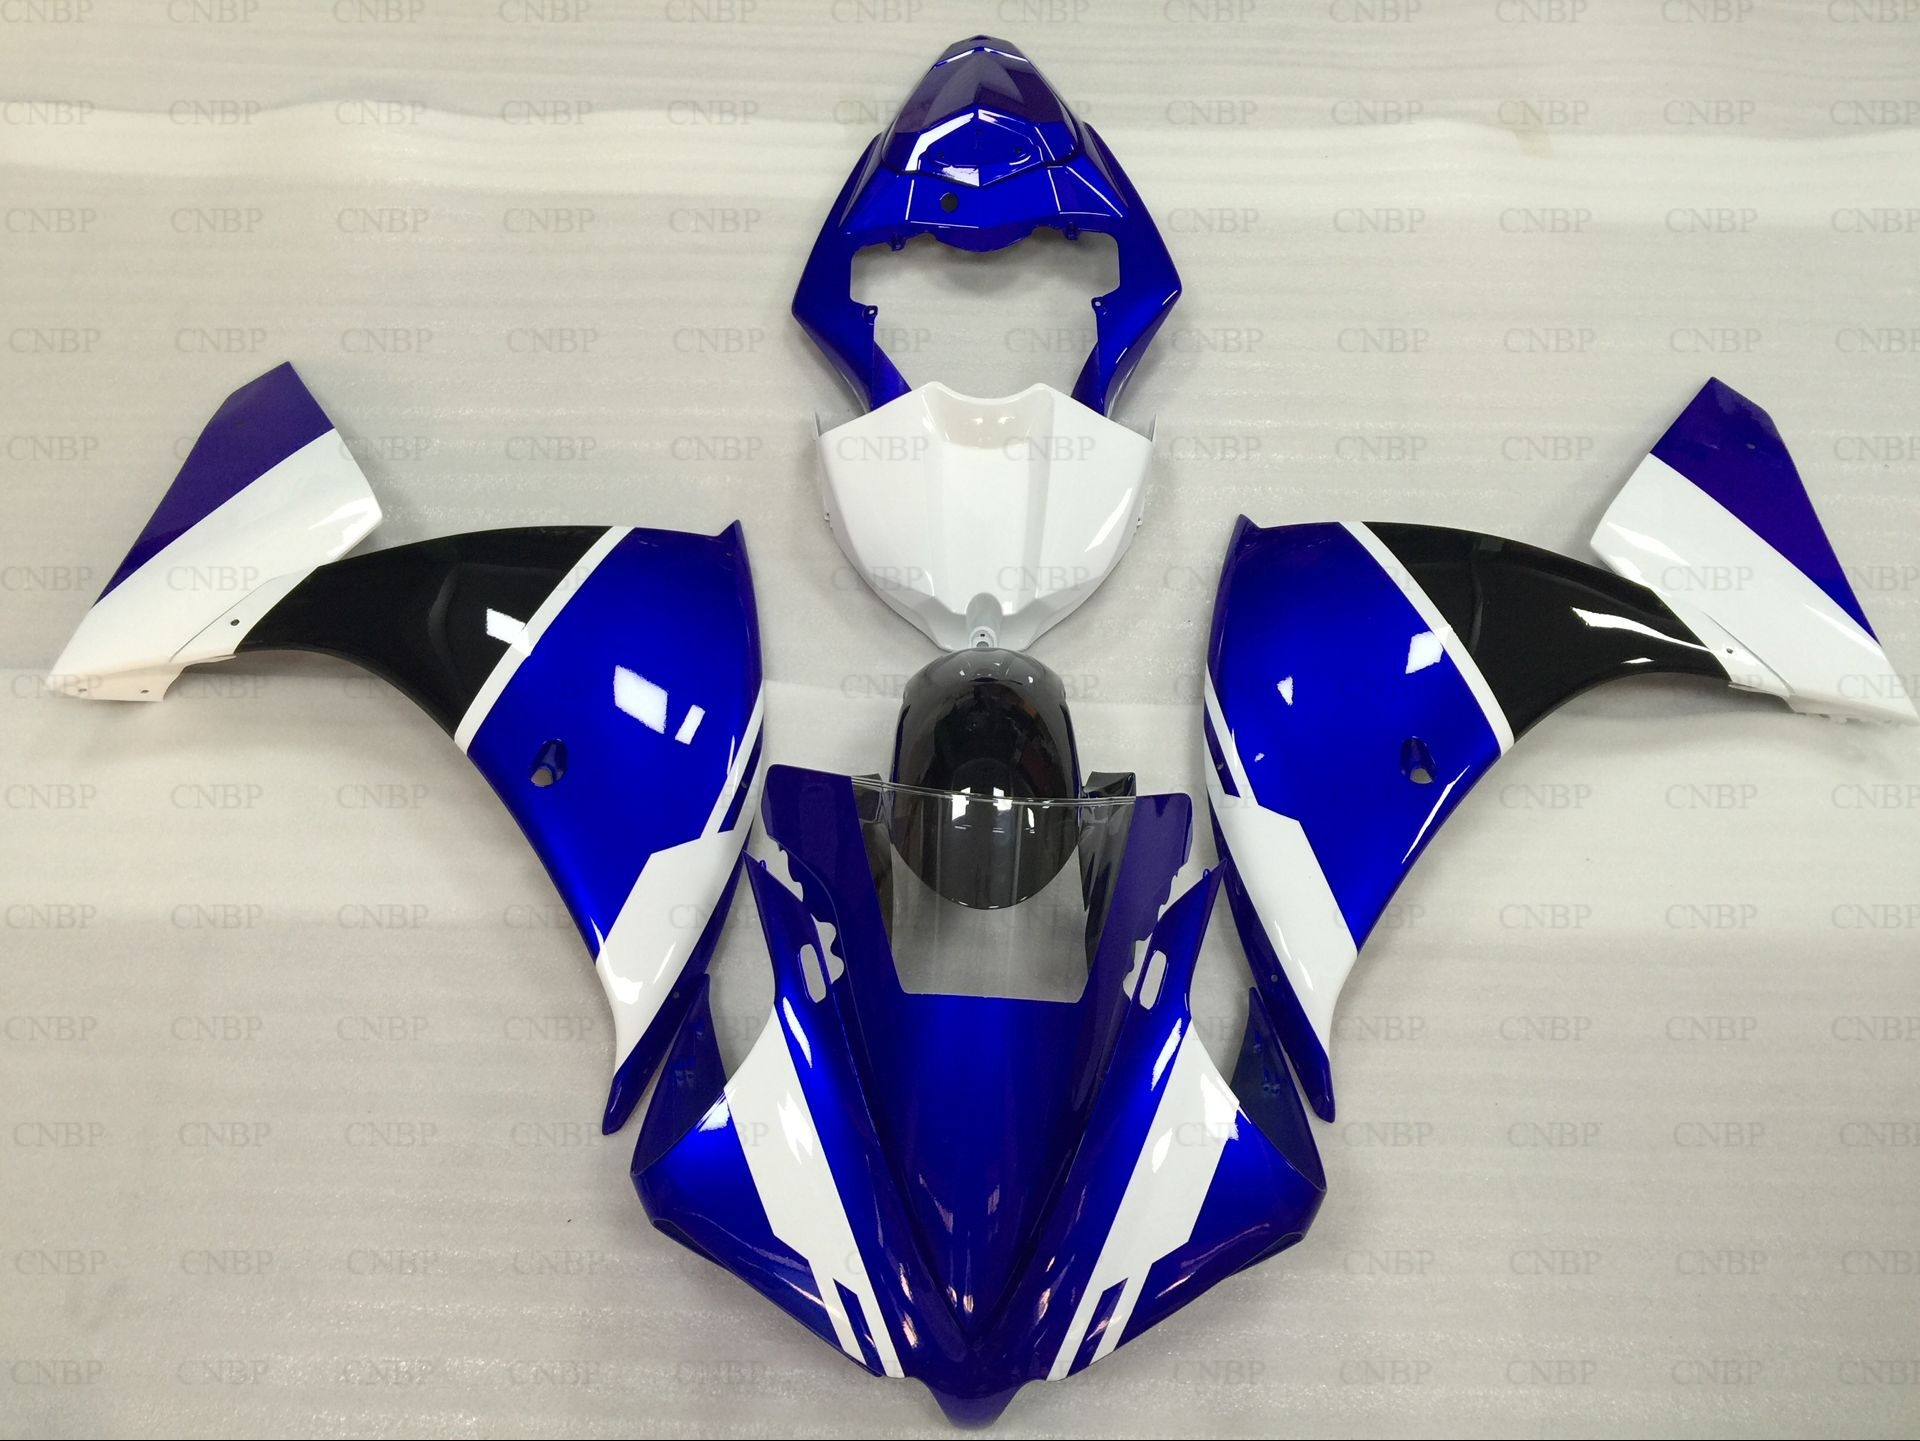 Body Kits for YAMAHA YZFR1 2013 Fairings YZF1000 R1 13 14 2012 - 2014 Blue for movistar Fairing Kits YZFR1 12 13